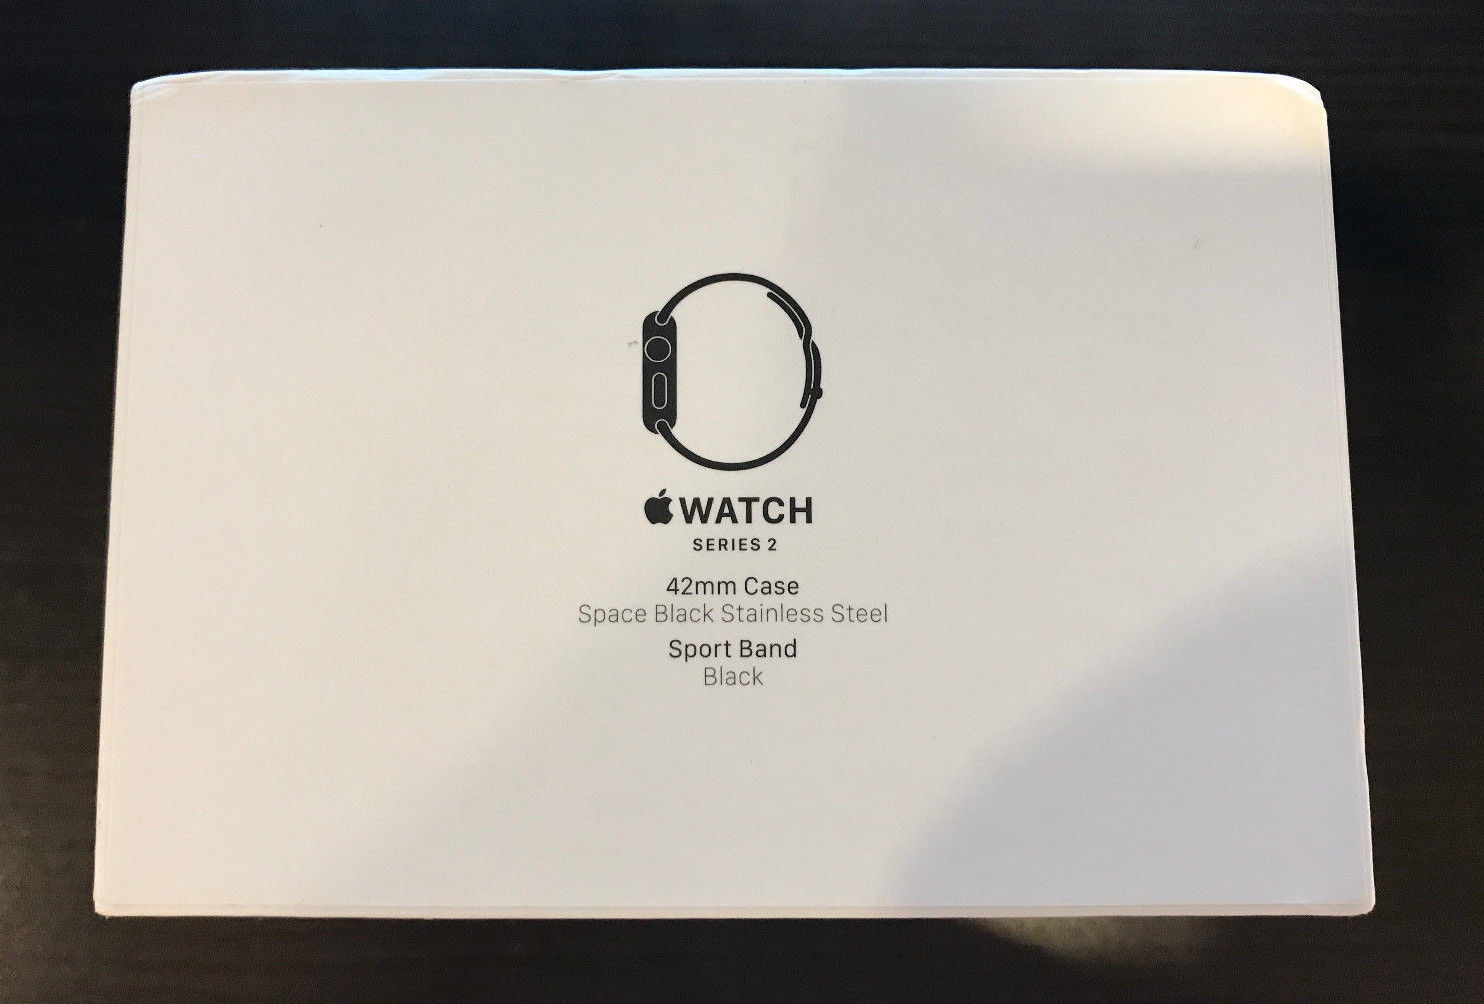 Apple Watch Series 2 42mm Space Black Stainless Steel My